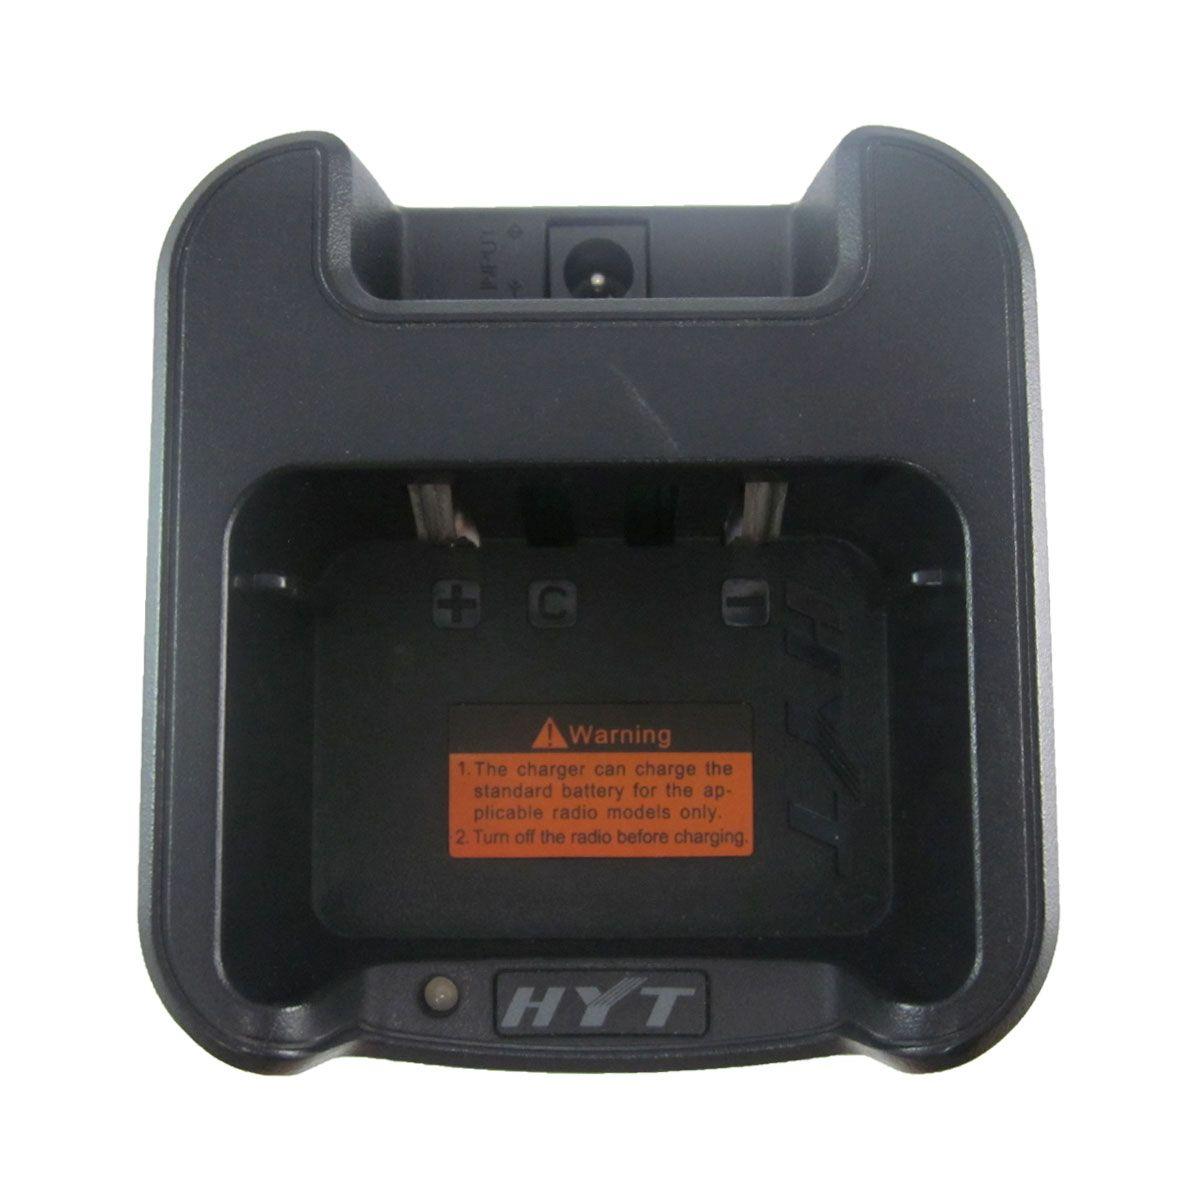 Cargador individual Hytera de carga rápida CH10L19